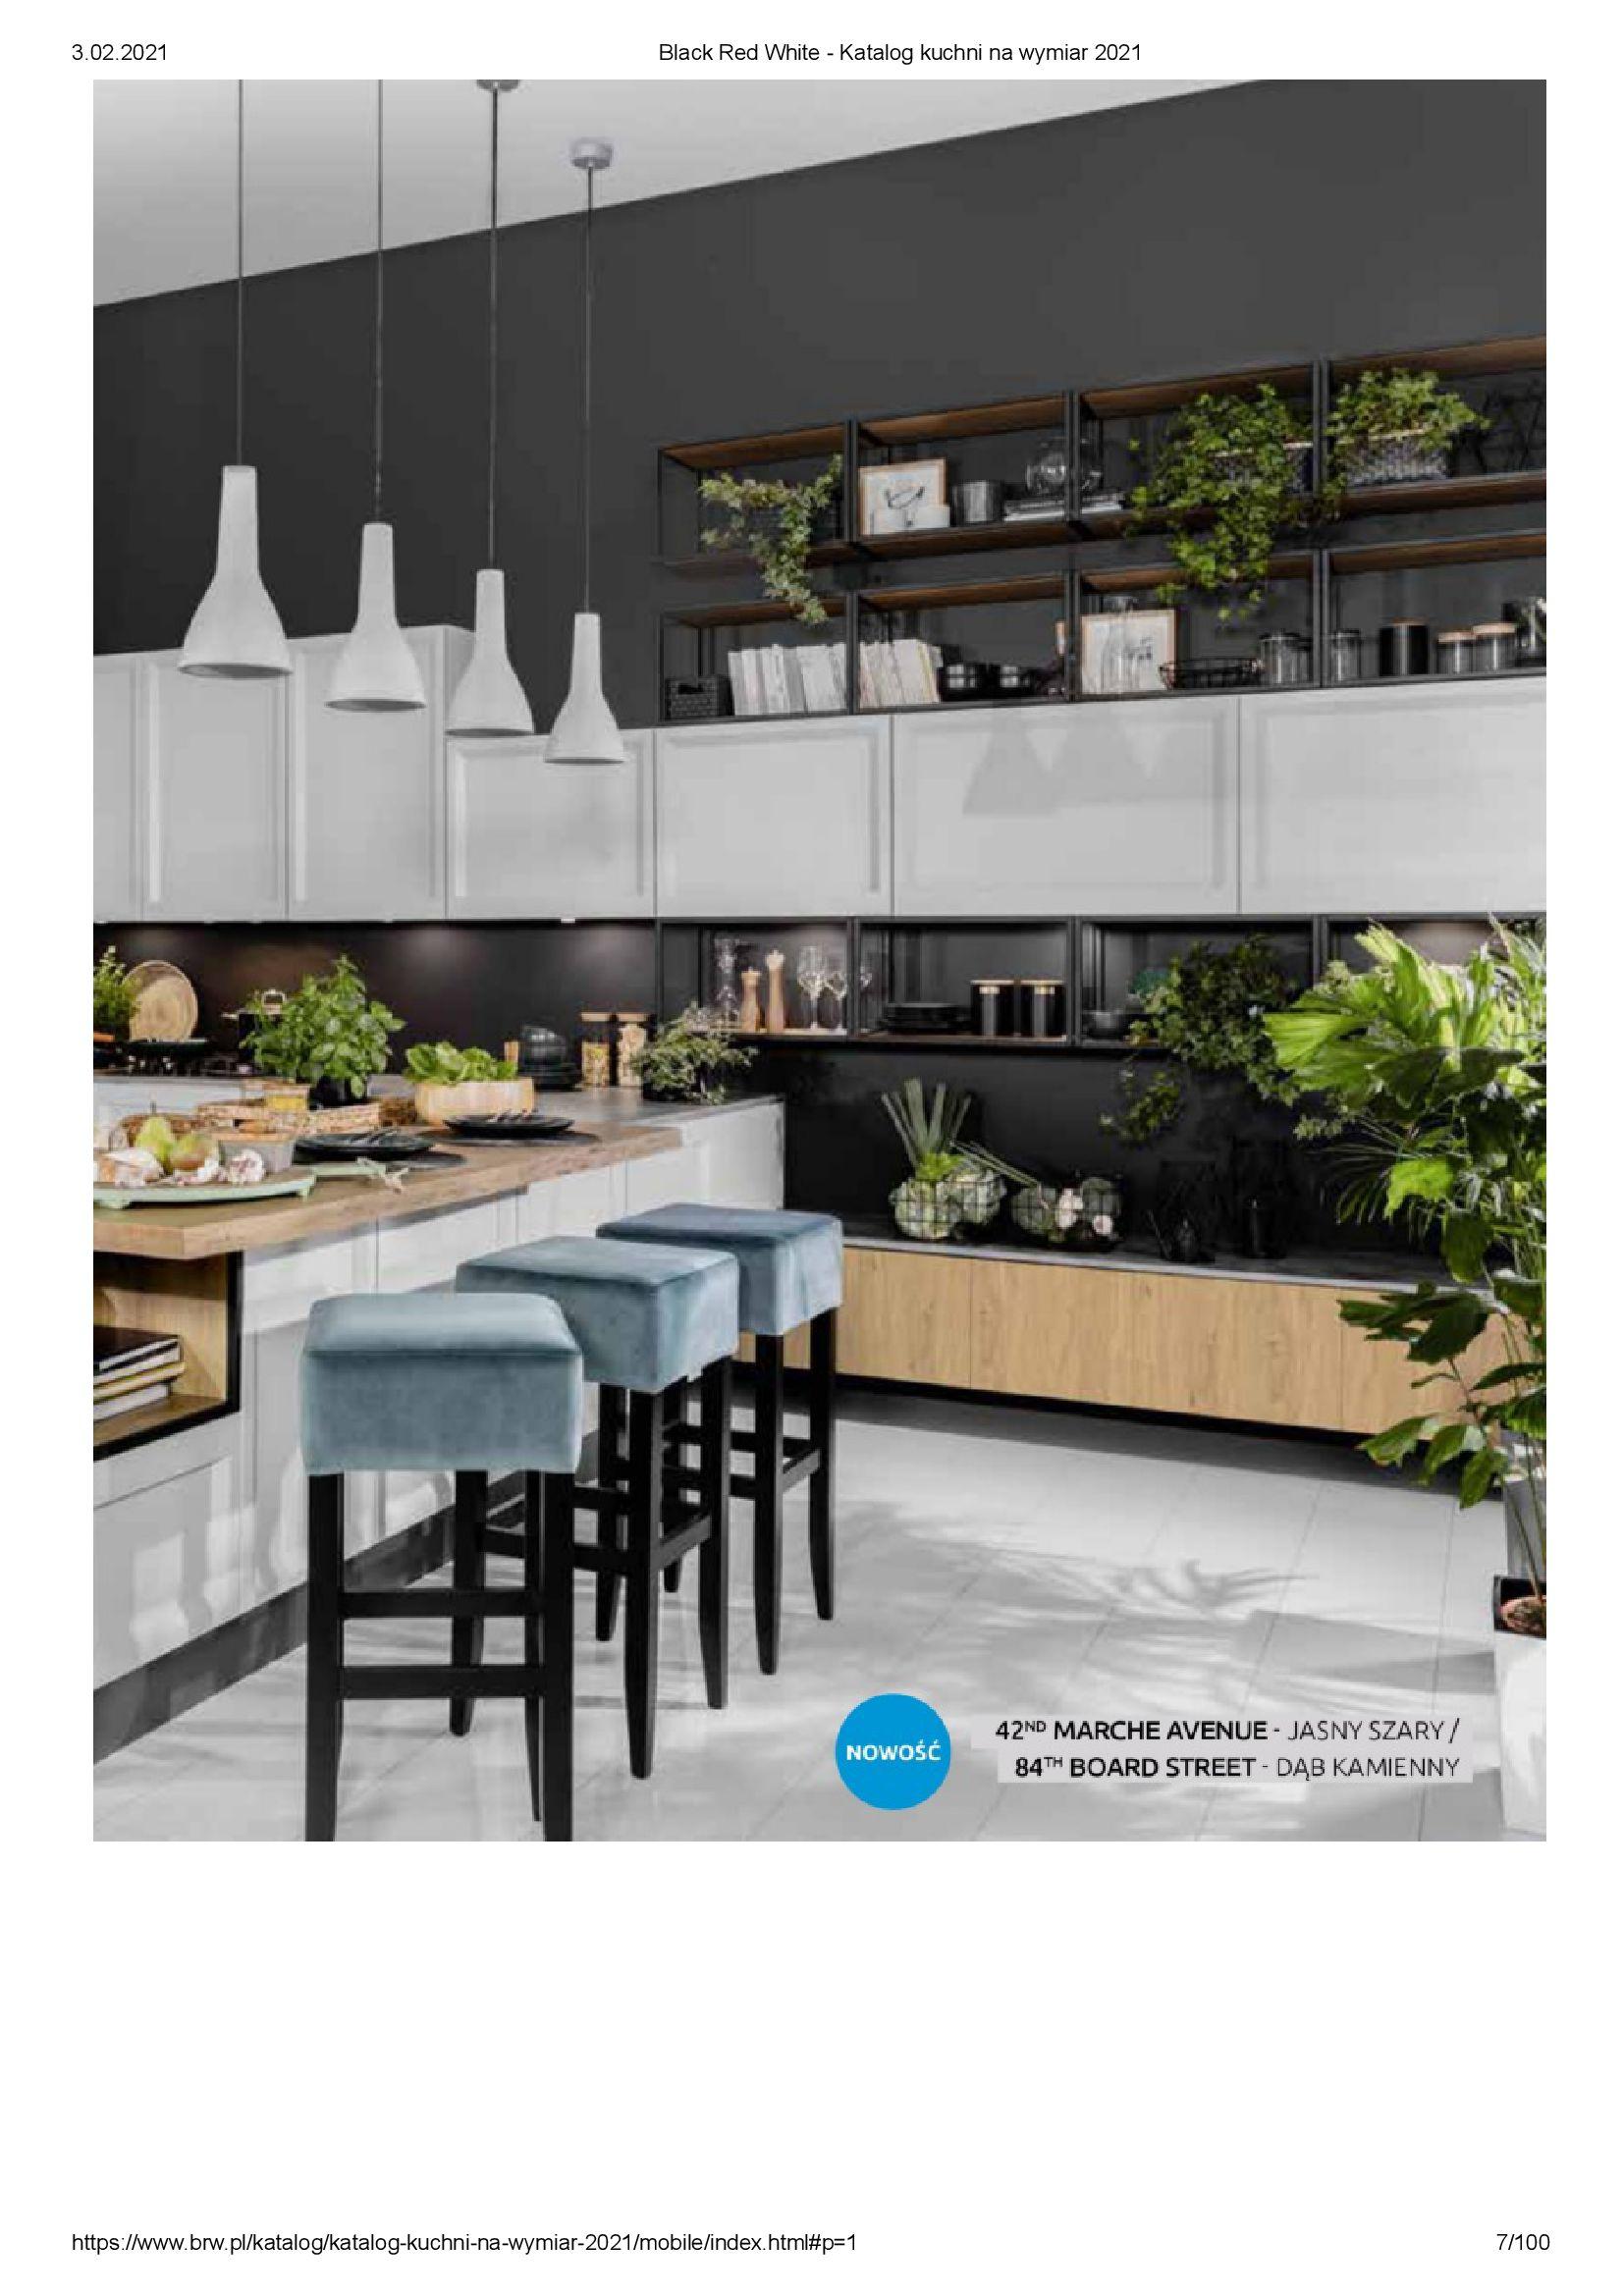 Gazetka Black Red White: Katalog - Kuchnie na wymiar Senso Kitchens 2021 2021-01-01 page-7